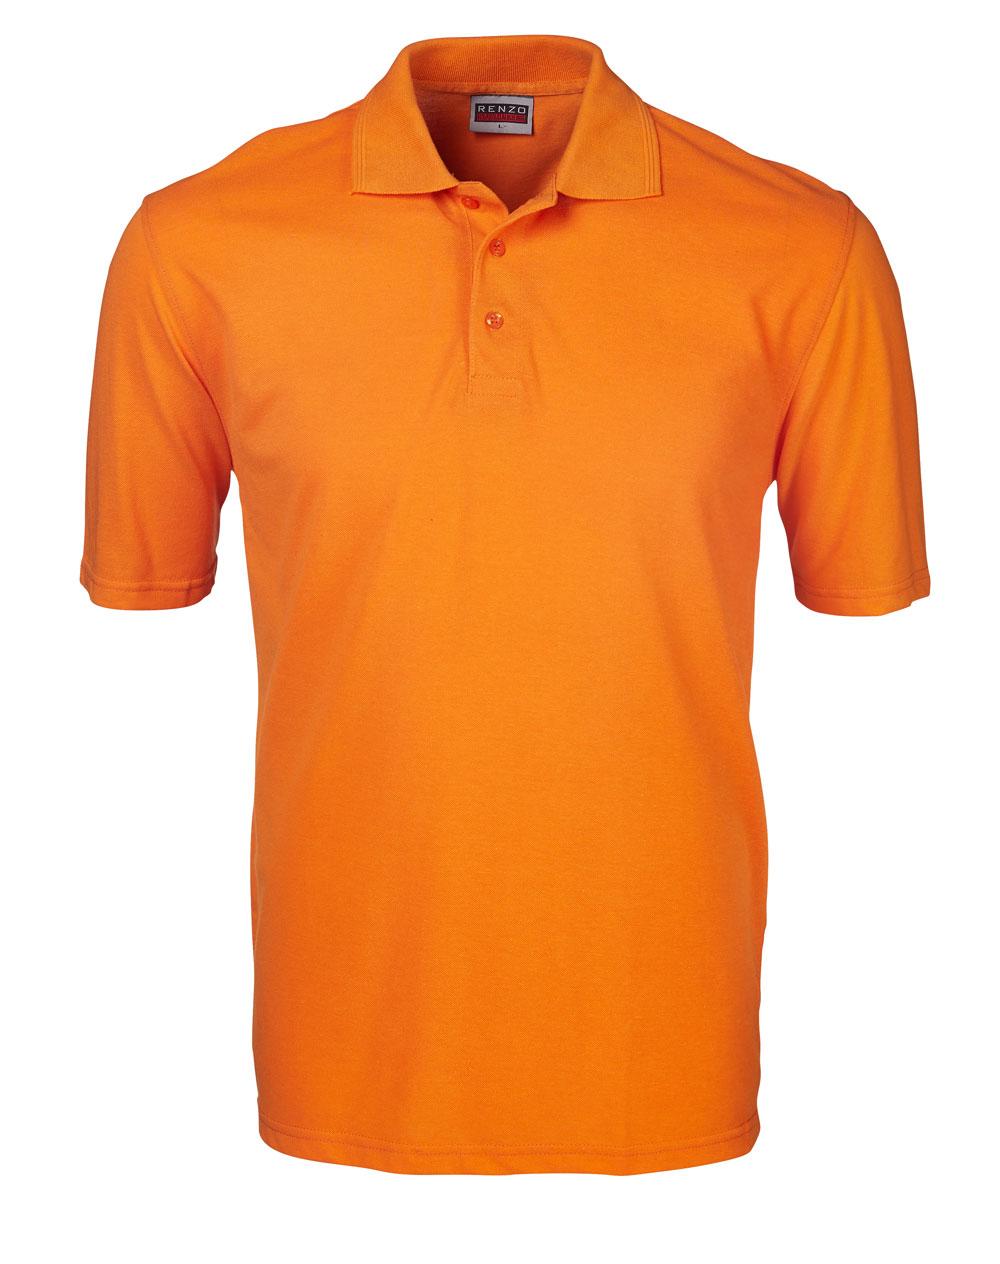 P18 Pique Golfer - Orange